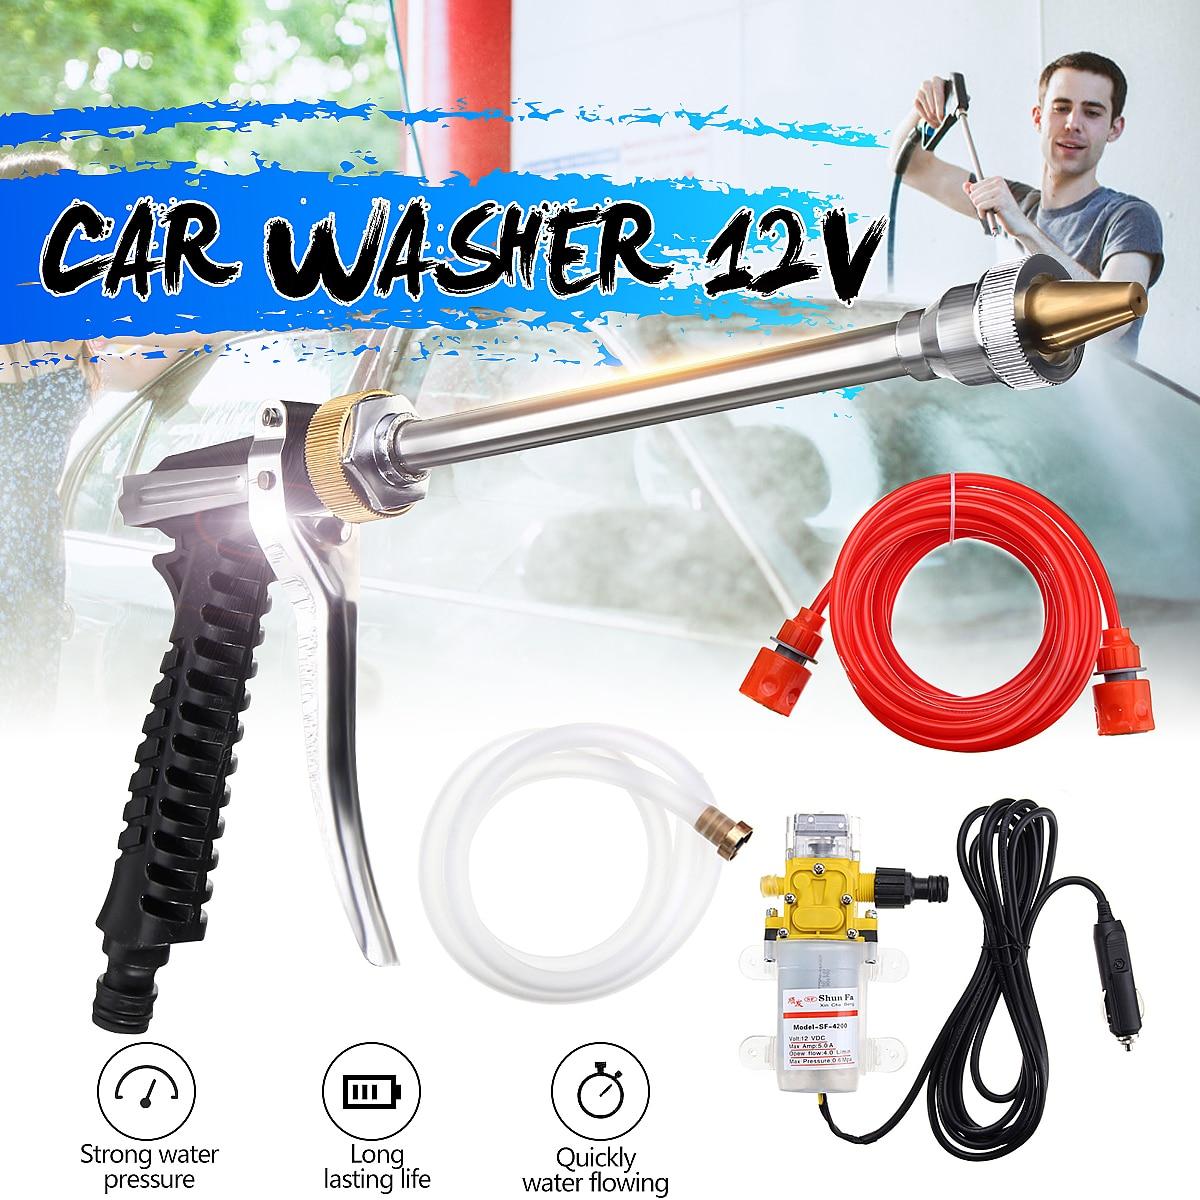 100W Portable High Pressure Car Electric Washer Wash Water Gun Set 12V 160PSI US